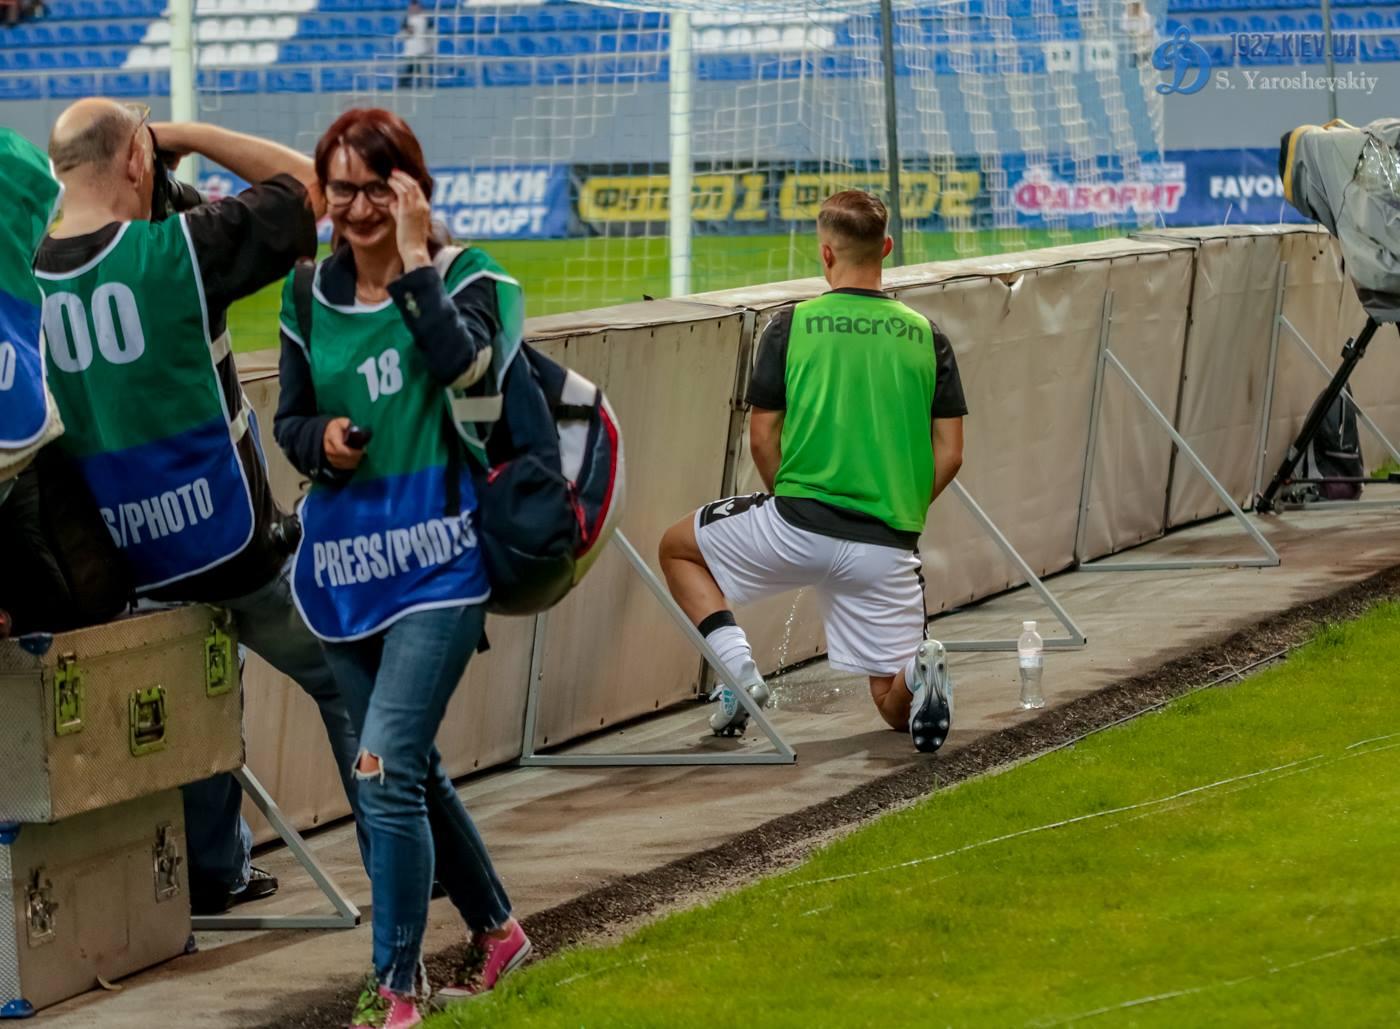 Плекас справил нужду за воротами во время матча